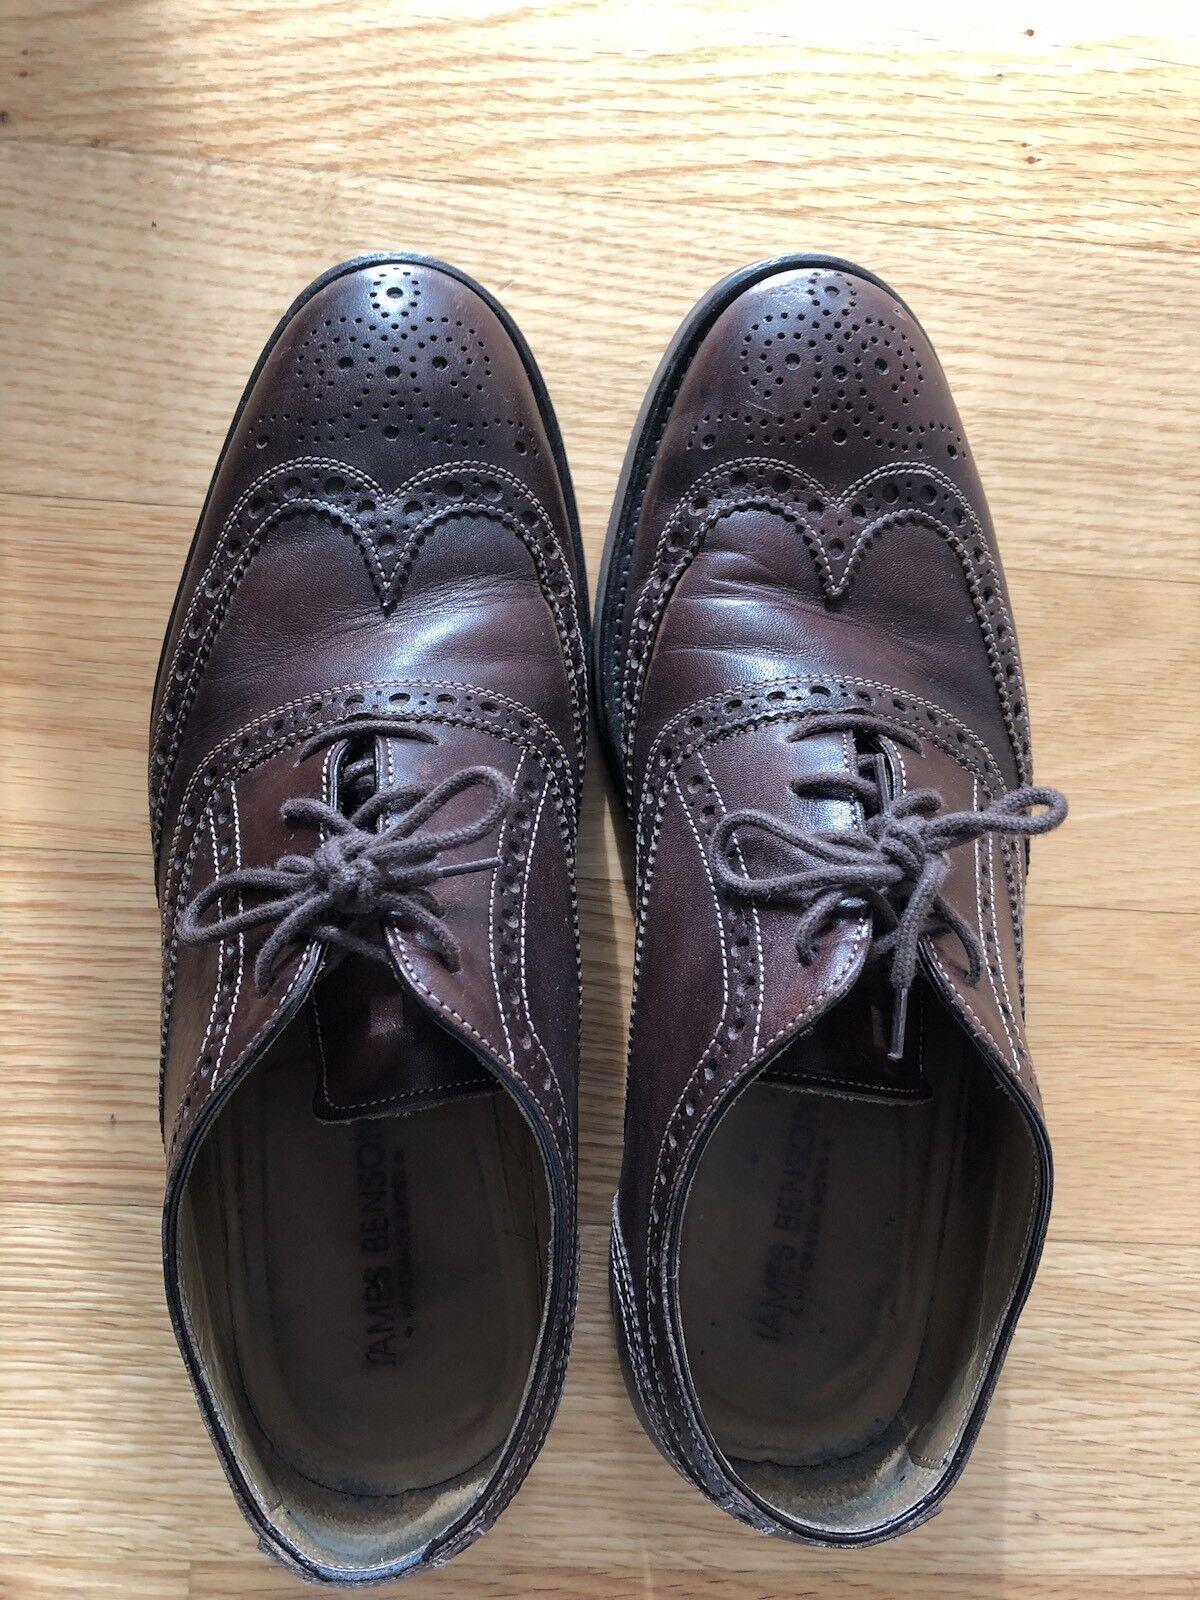 Gumlite James Benson Dress Handmade Leather Shoes Oxfords Dress Benson Brown Wingtip 734413